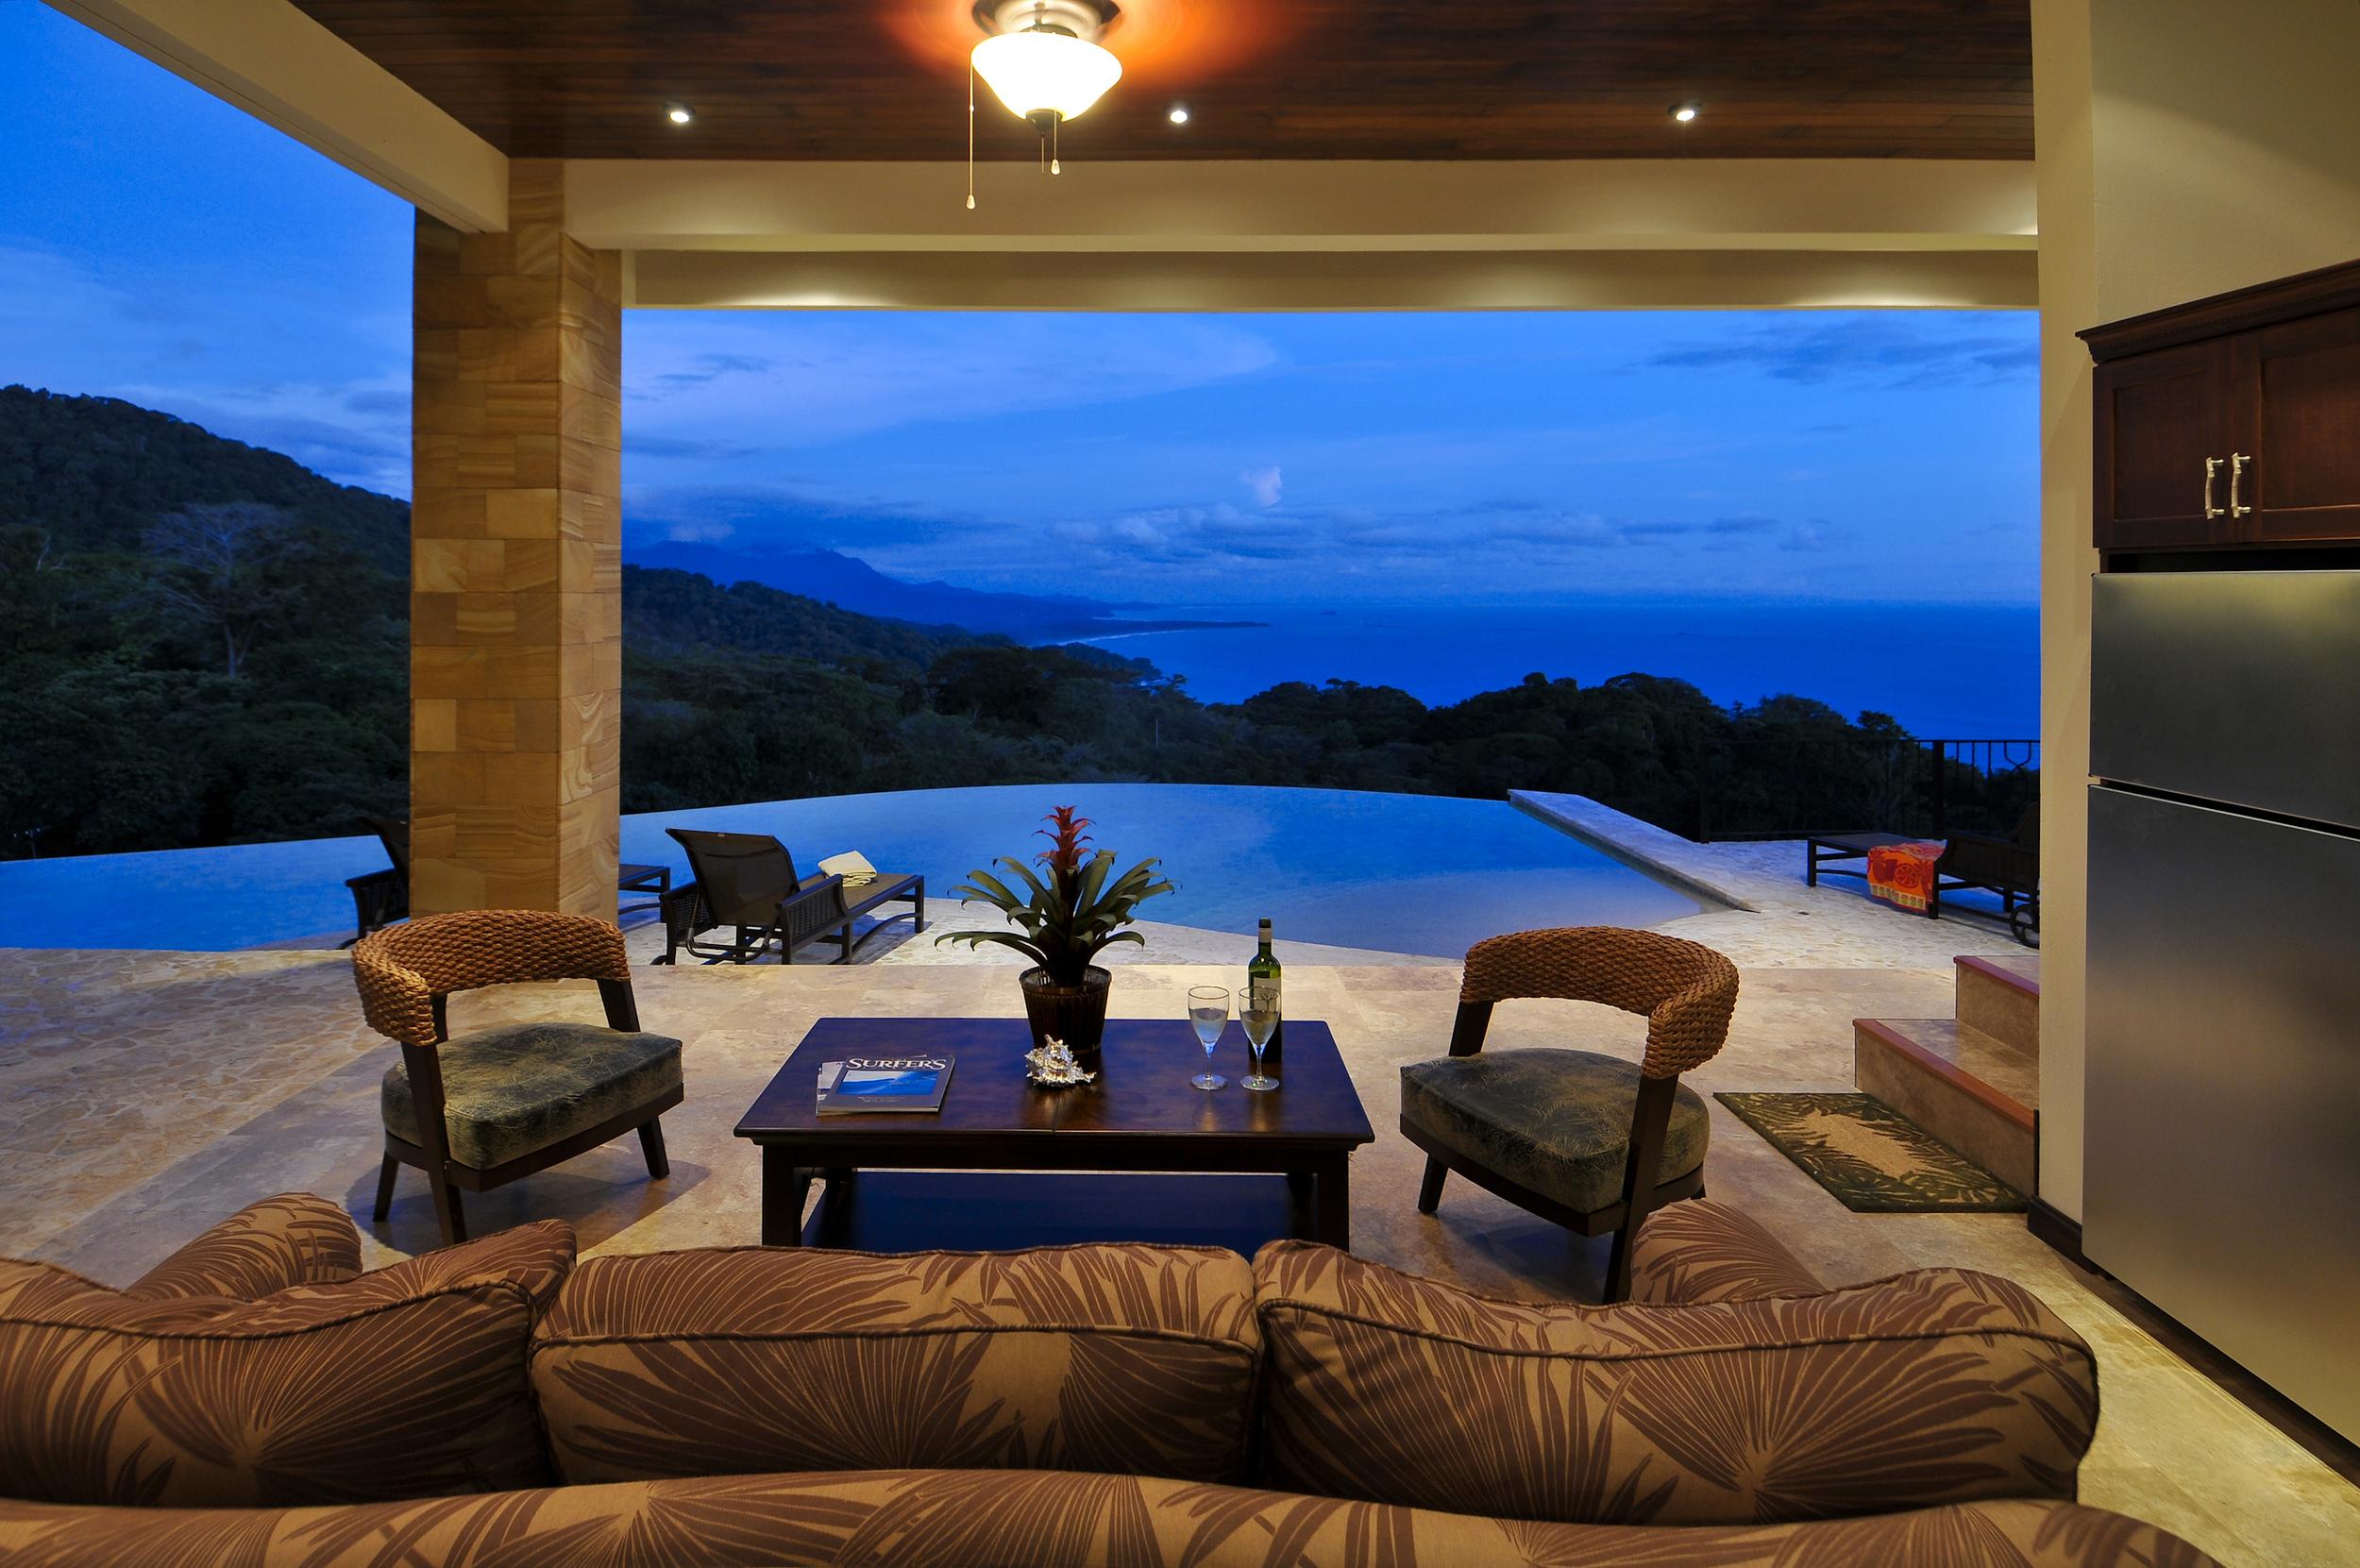 flex5-yoga-retreat-costa-rica-villa-infinity-pool-room-sunset-ocean-view.jpg